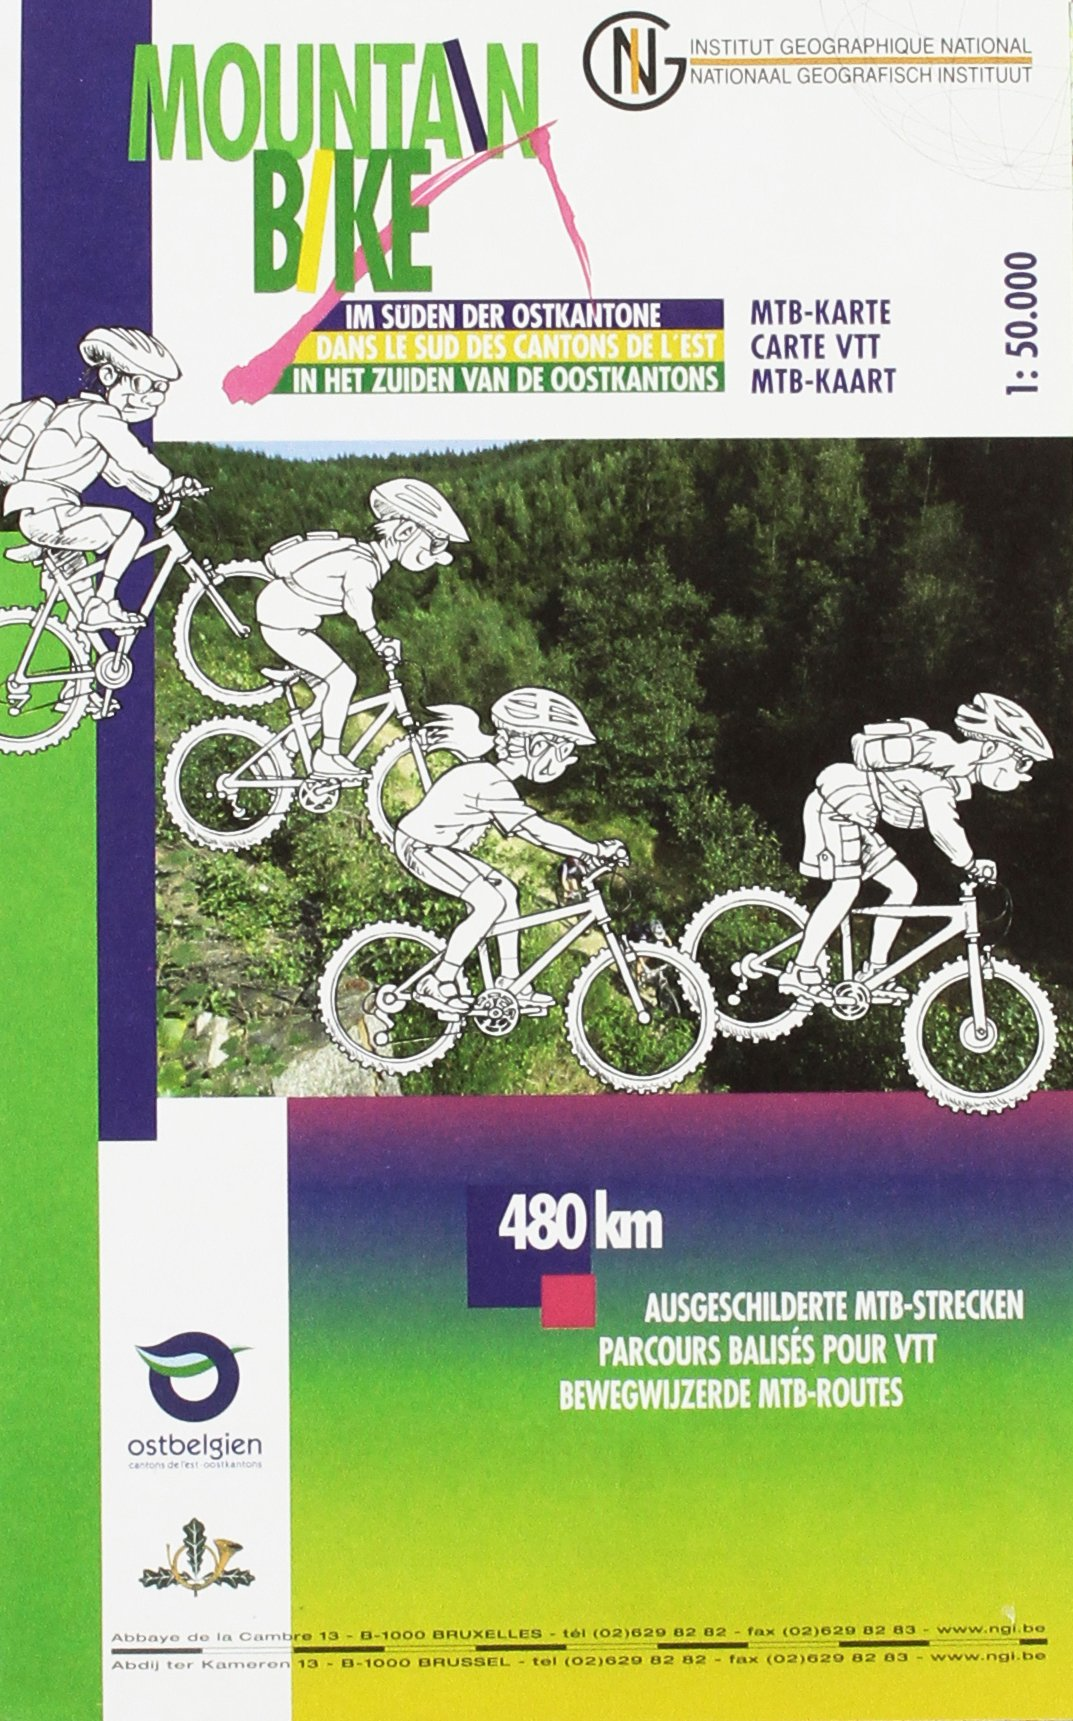 Mountainbike Ostkantone Süd 1 : 50 000 mit MTB / Radrouten (Mehrsprachig) Landkarte – 1. Januar 2014 NGI 9462350515 Karten / Stadtpläne / Europa Belgien